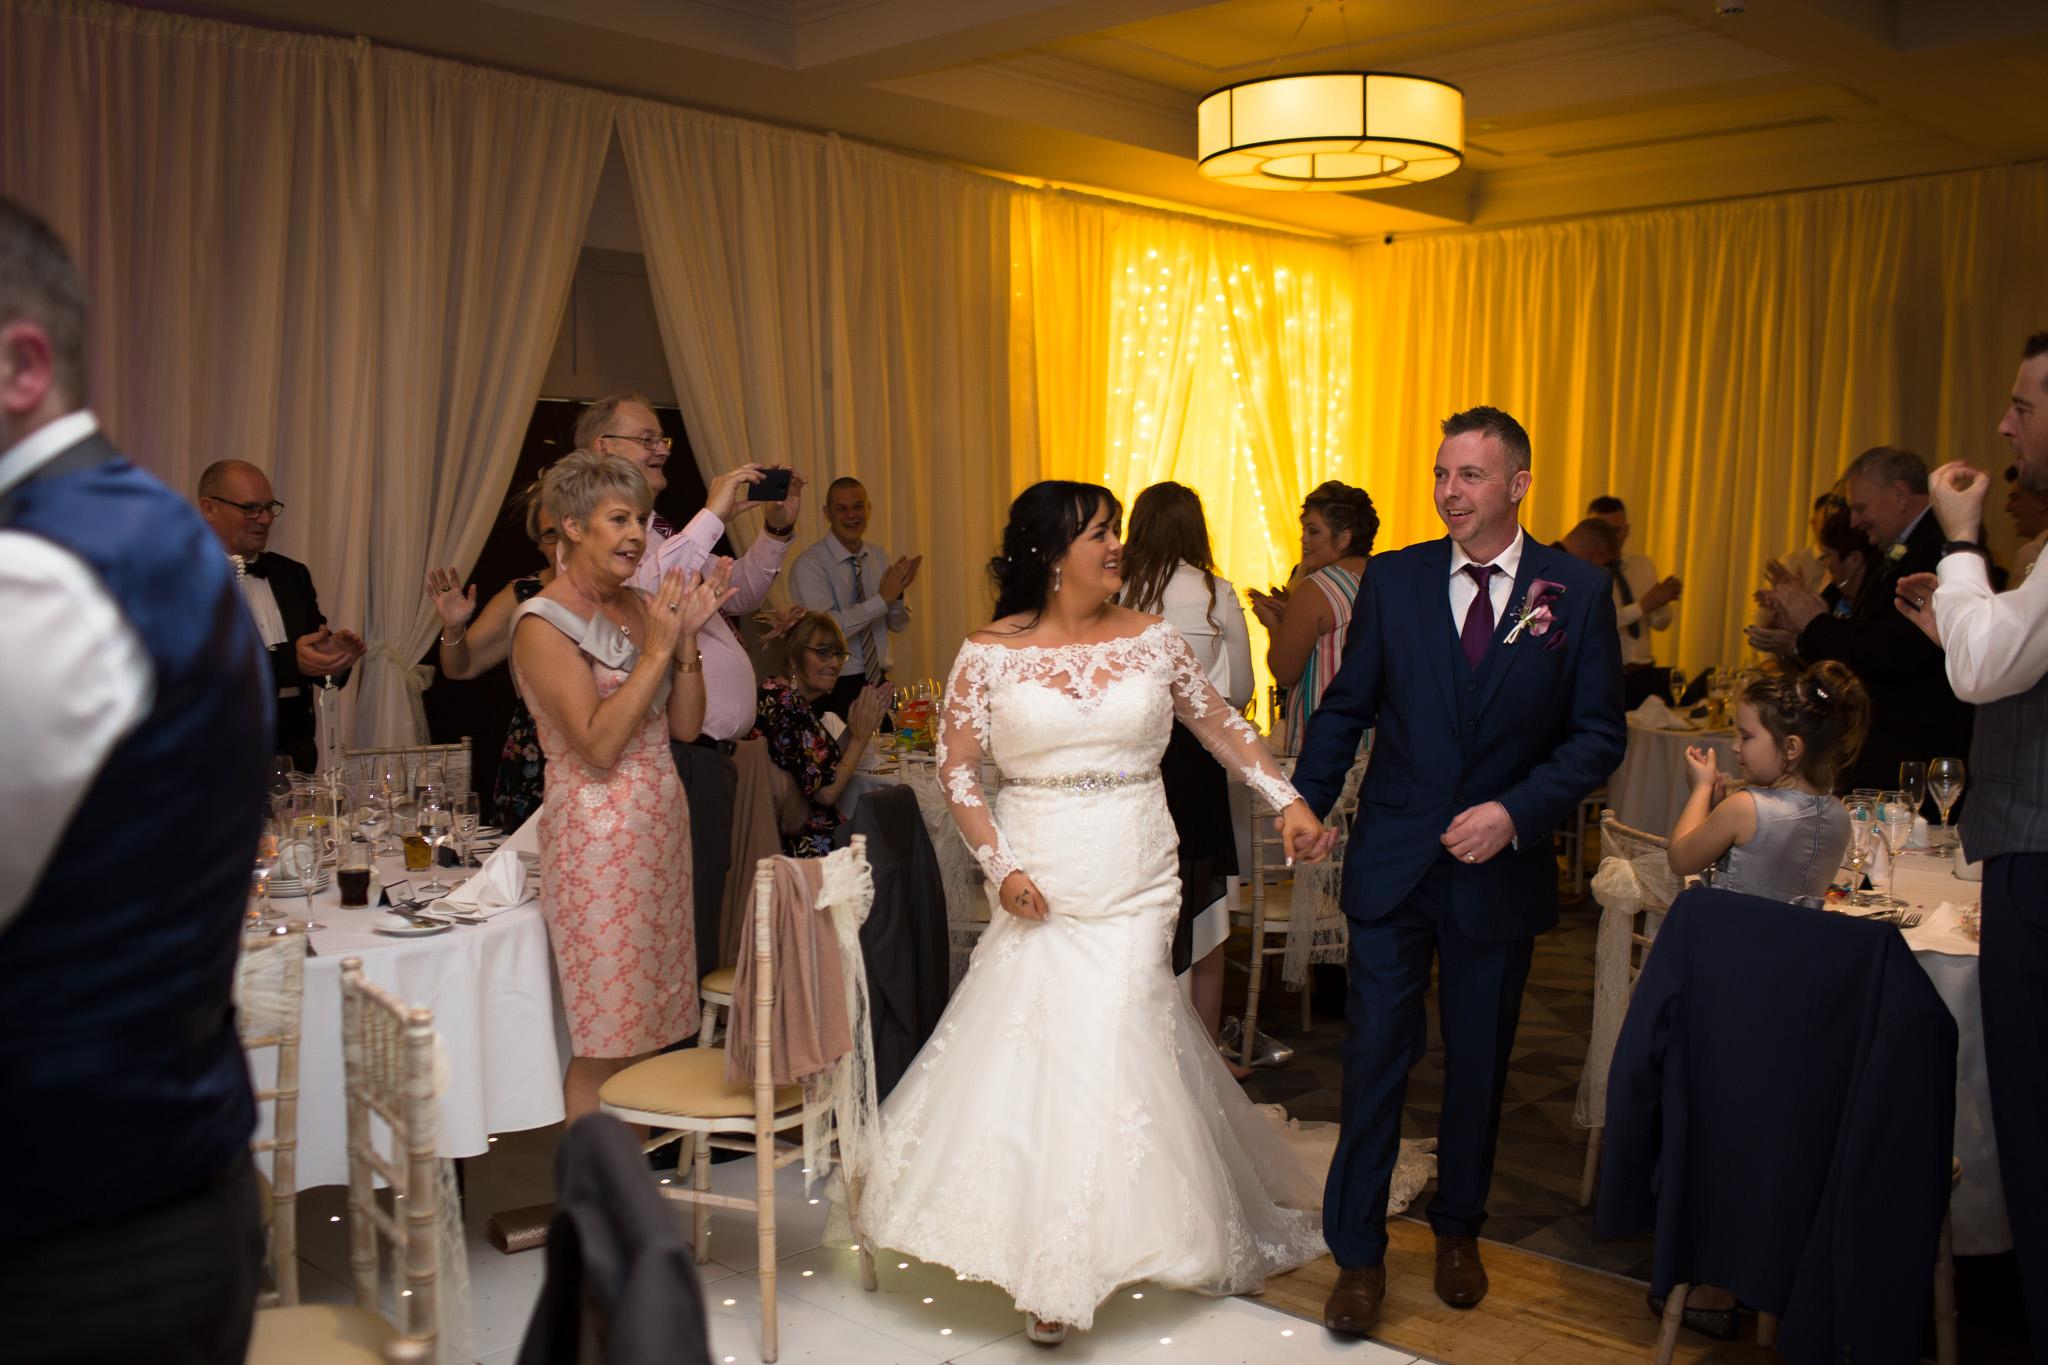 Mark_Barnes_Northern_Ireland_Wedding_Photography_Marine_hotel_ballycastle_Wedding_Photography_Janet&Darren-33.jpg